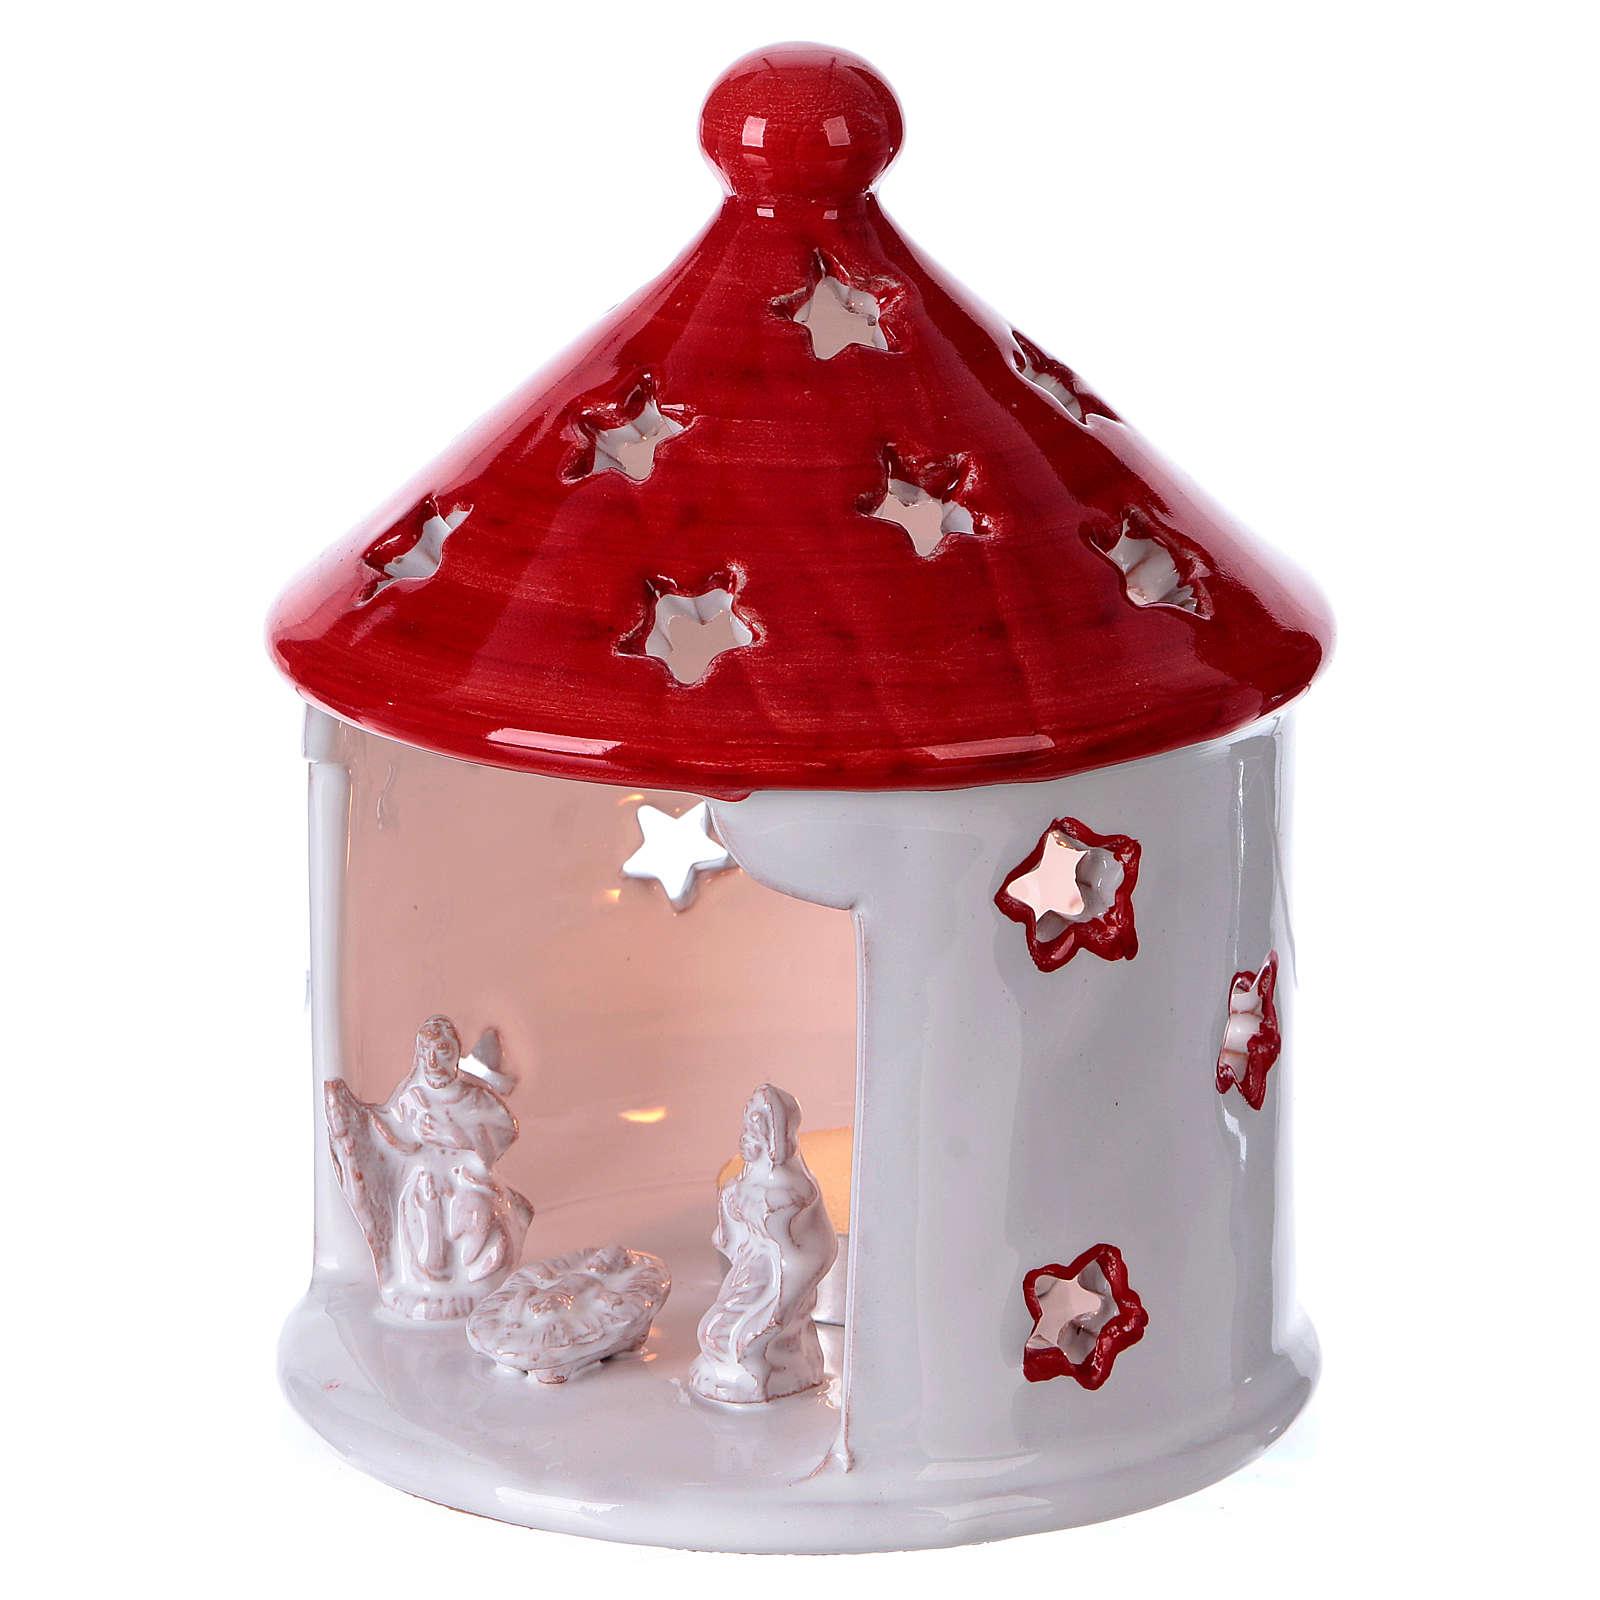 Cabaña blanca lúcida techo rojo con Natividad de terracota Deruta 4